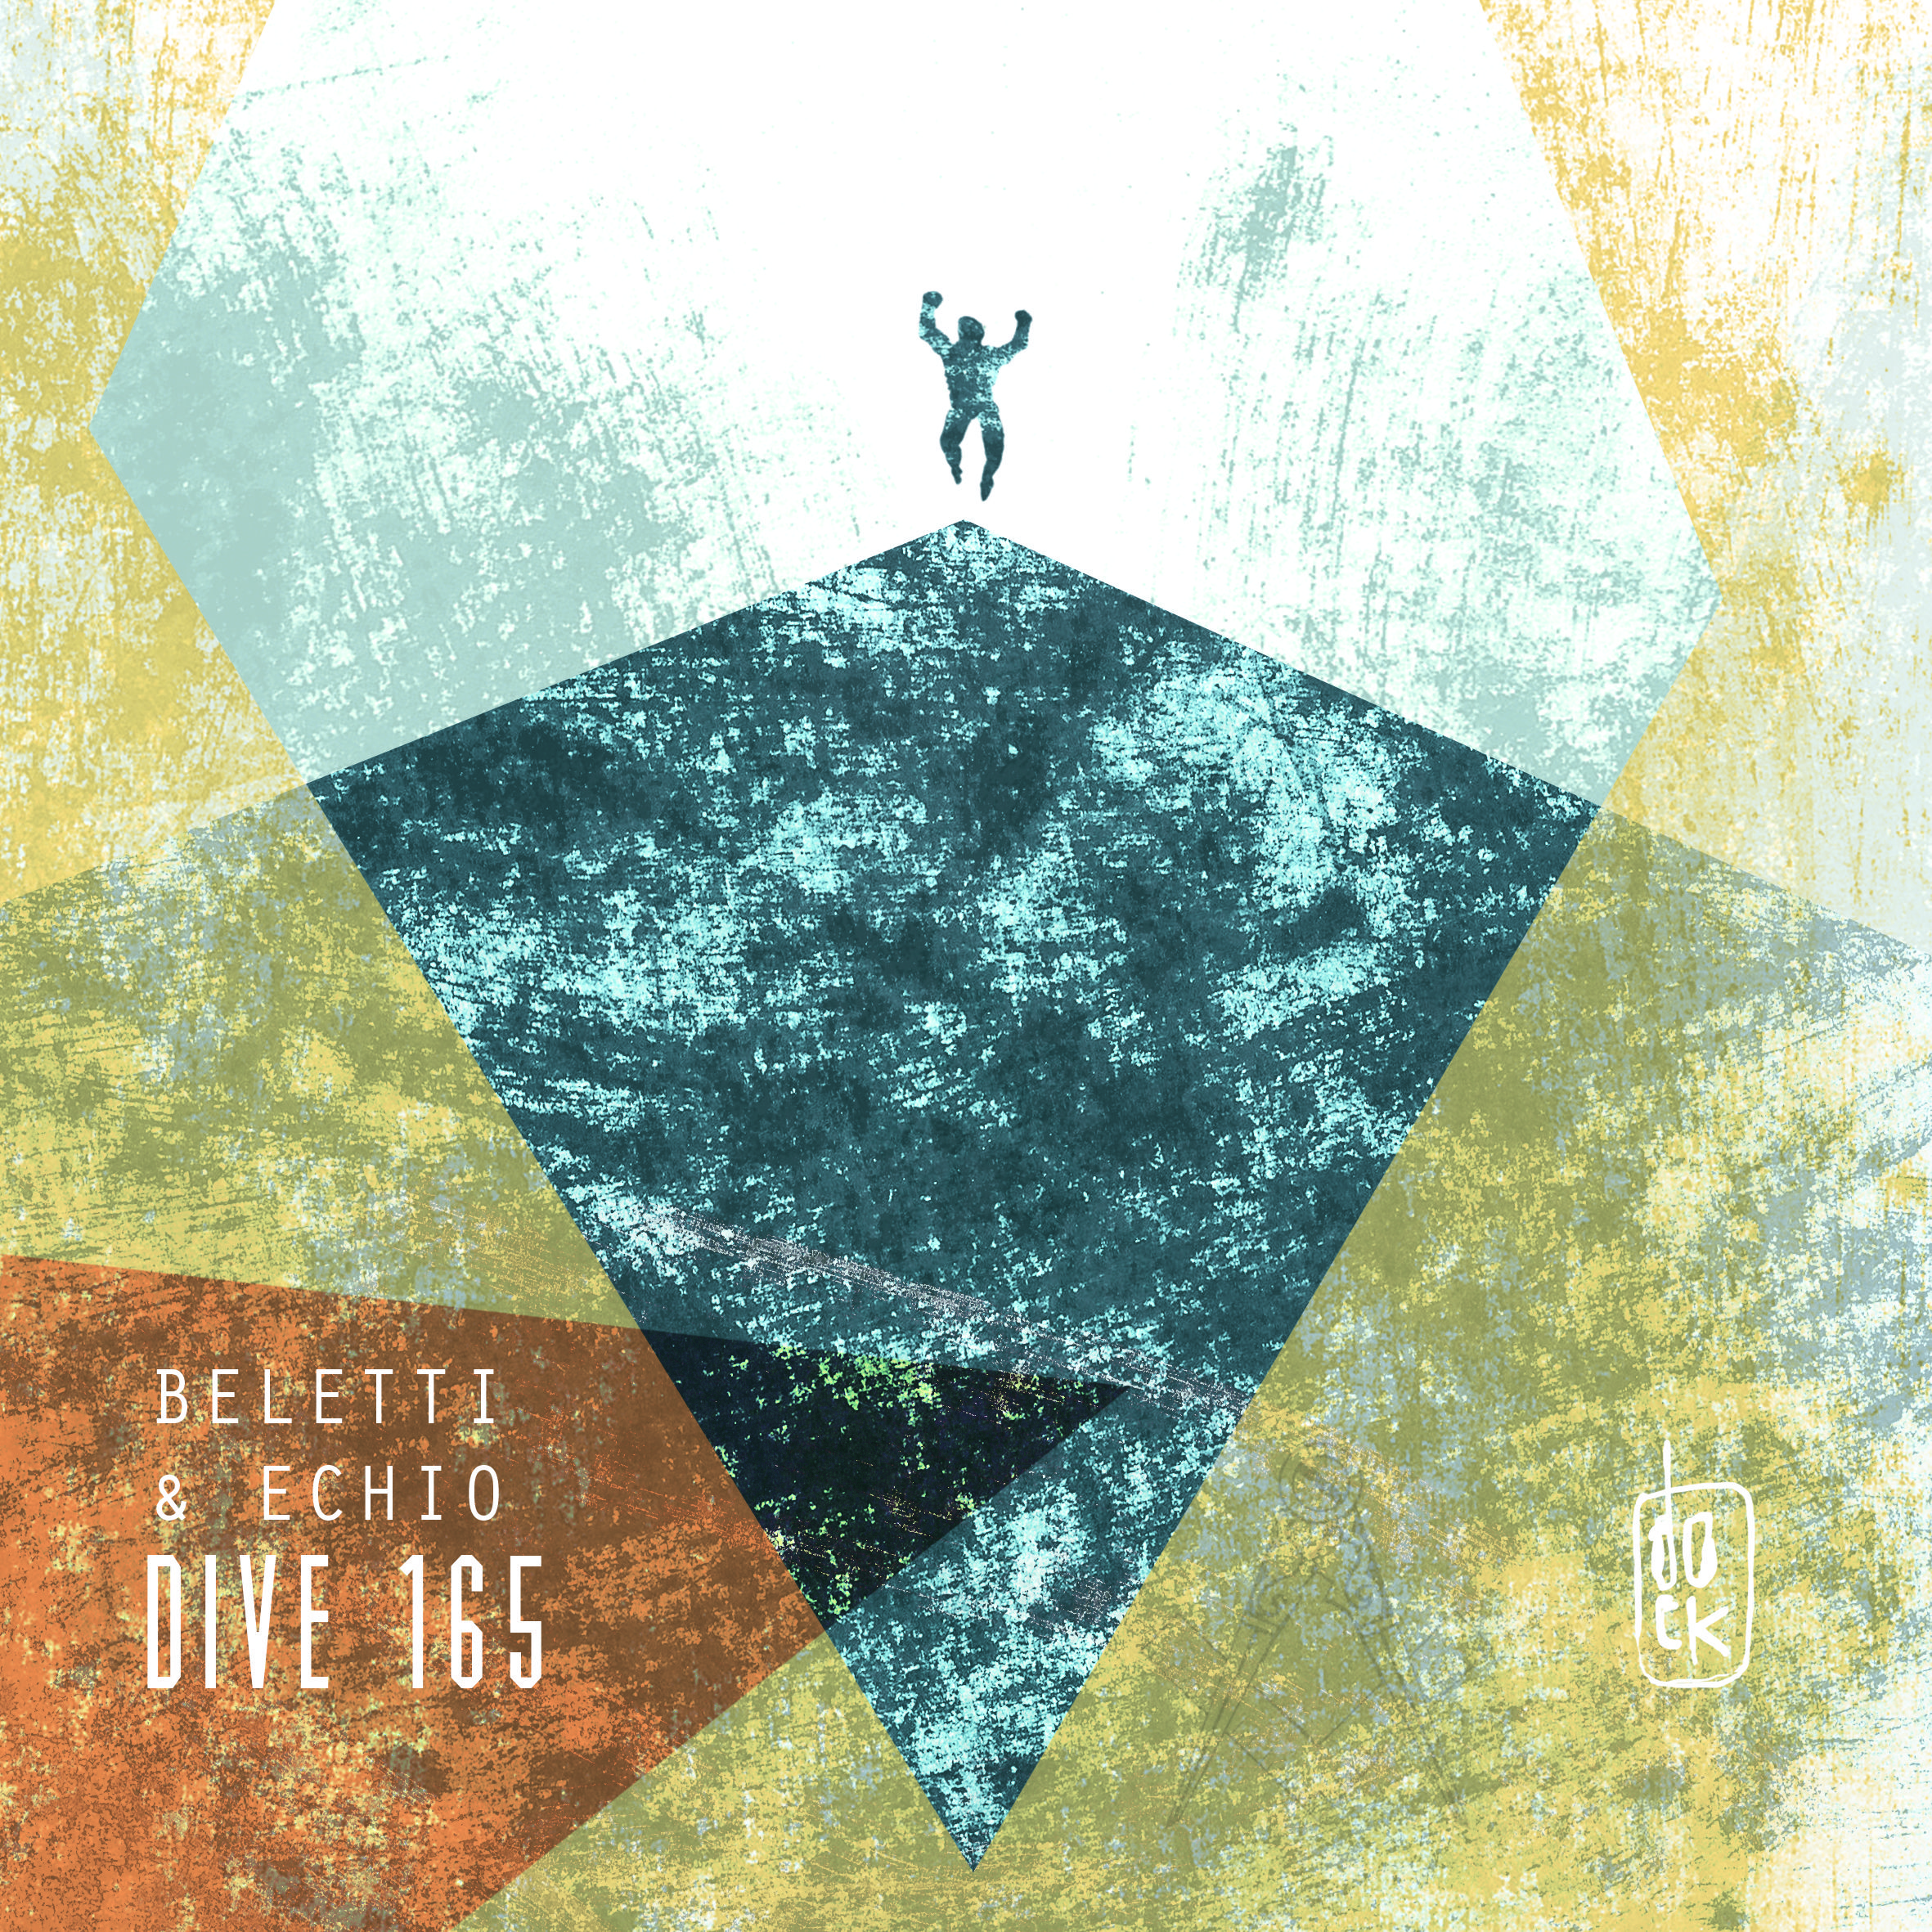 Dive 165 (Original) Beletti&Echio  Illustration by Dock